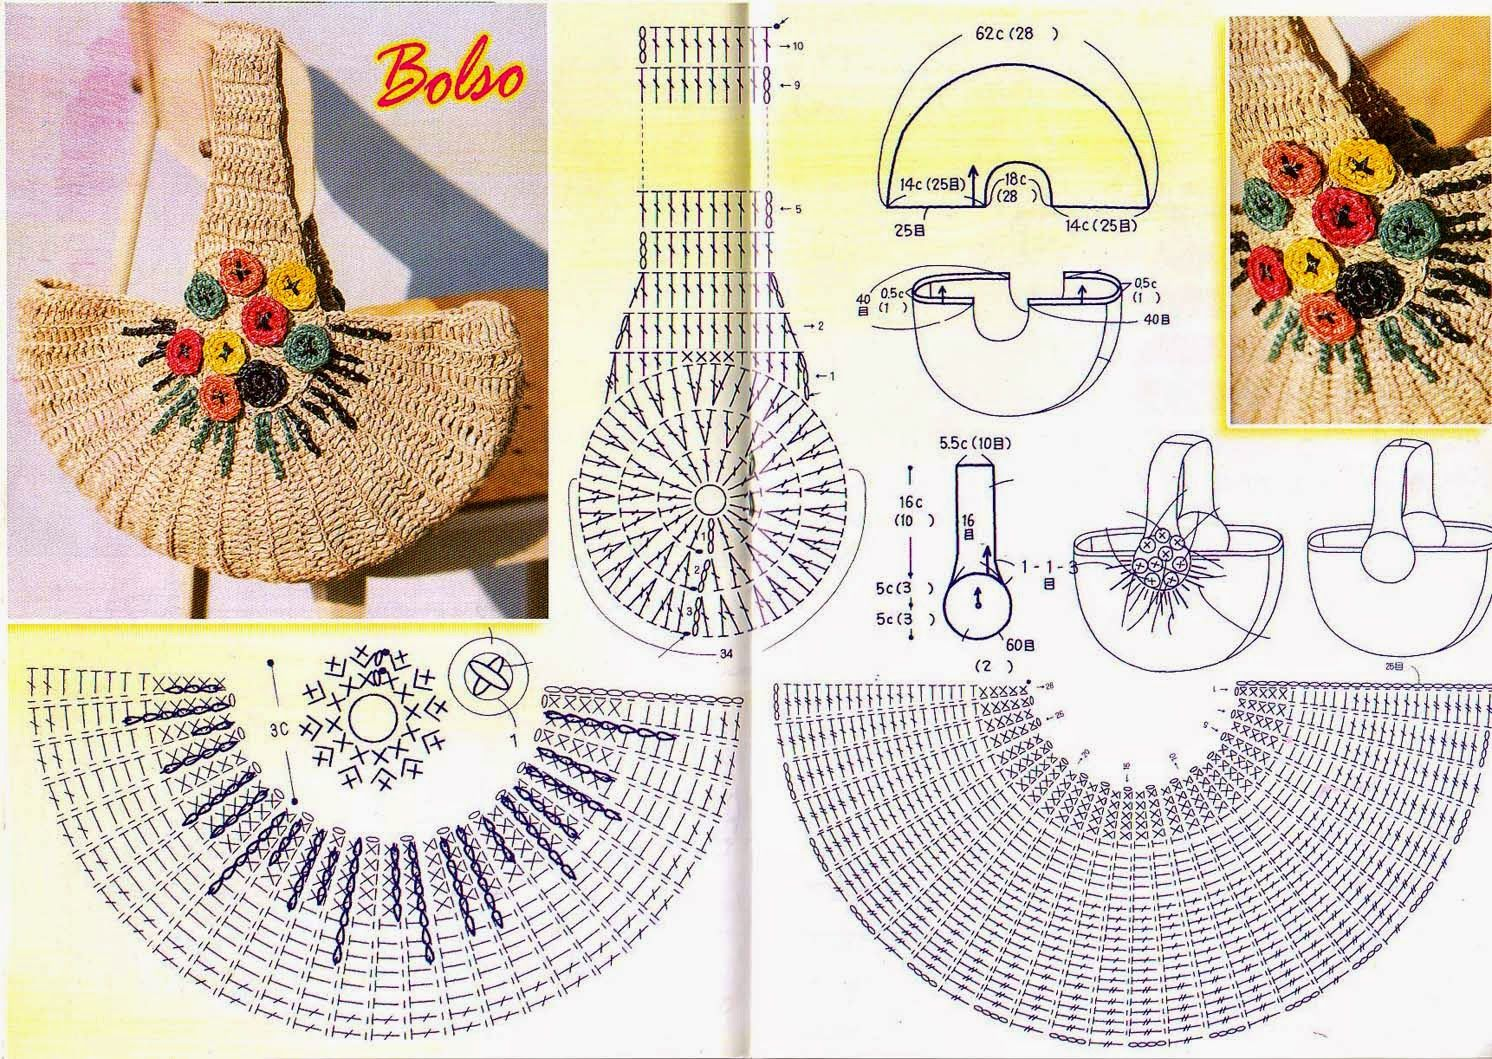 Esquema de bolso media luna a Crochet | crochet | Pinterest